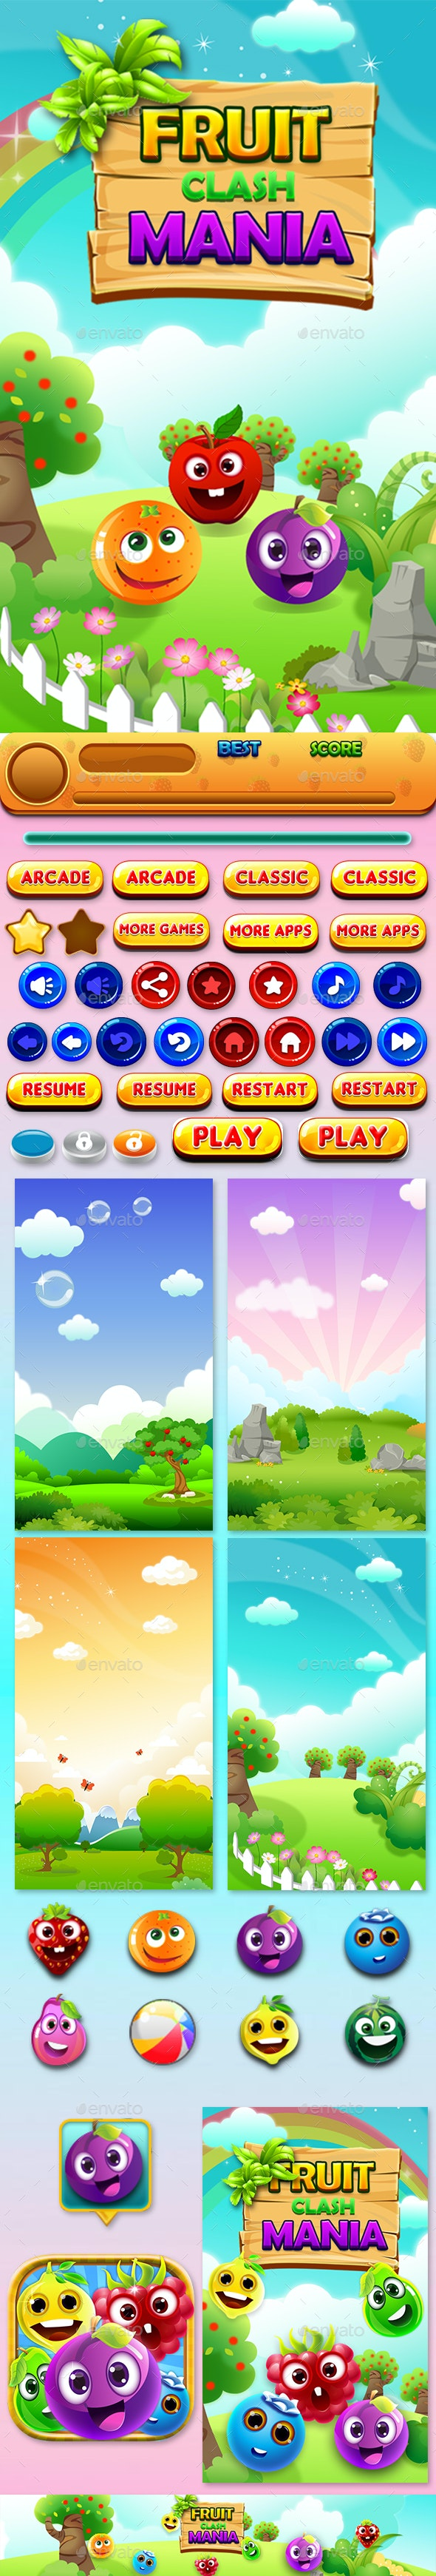 Match 3 Unity Asset Reskin: Fruits - Game Kits Game Assets